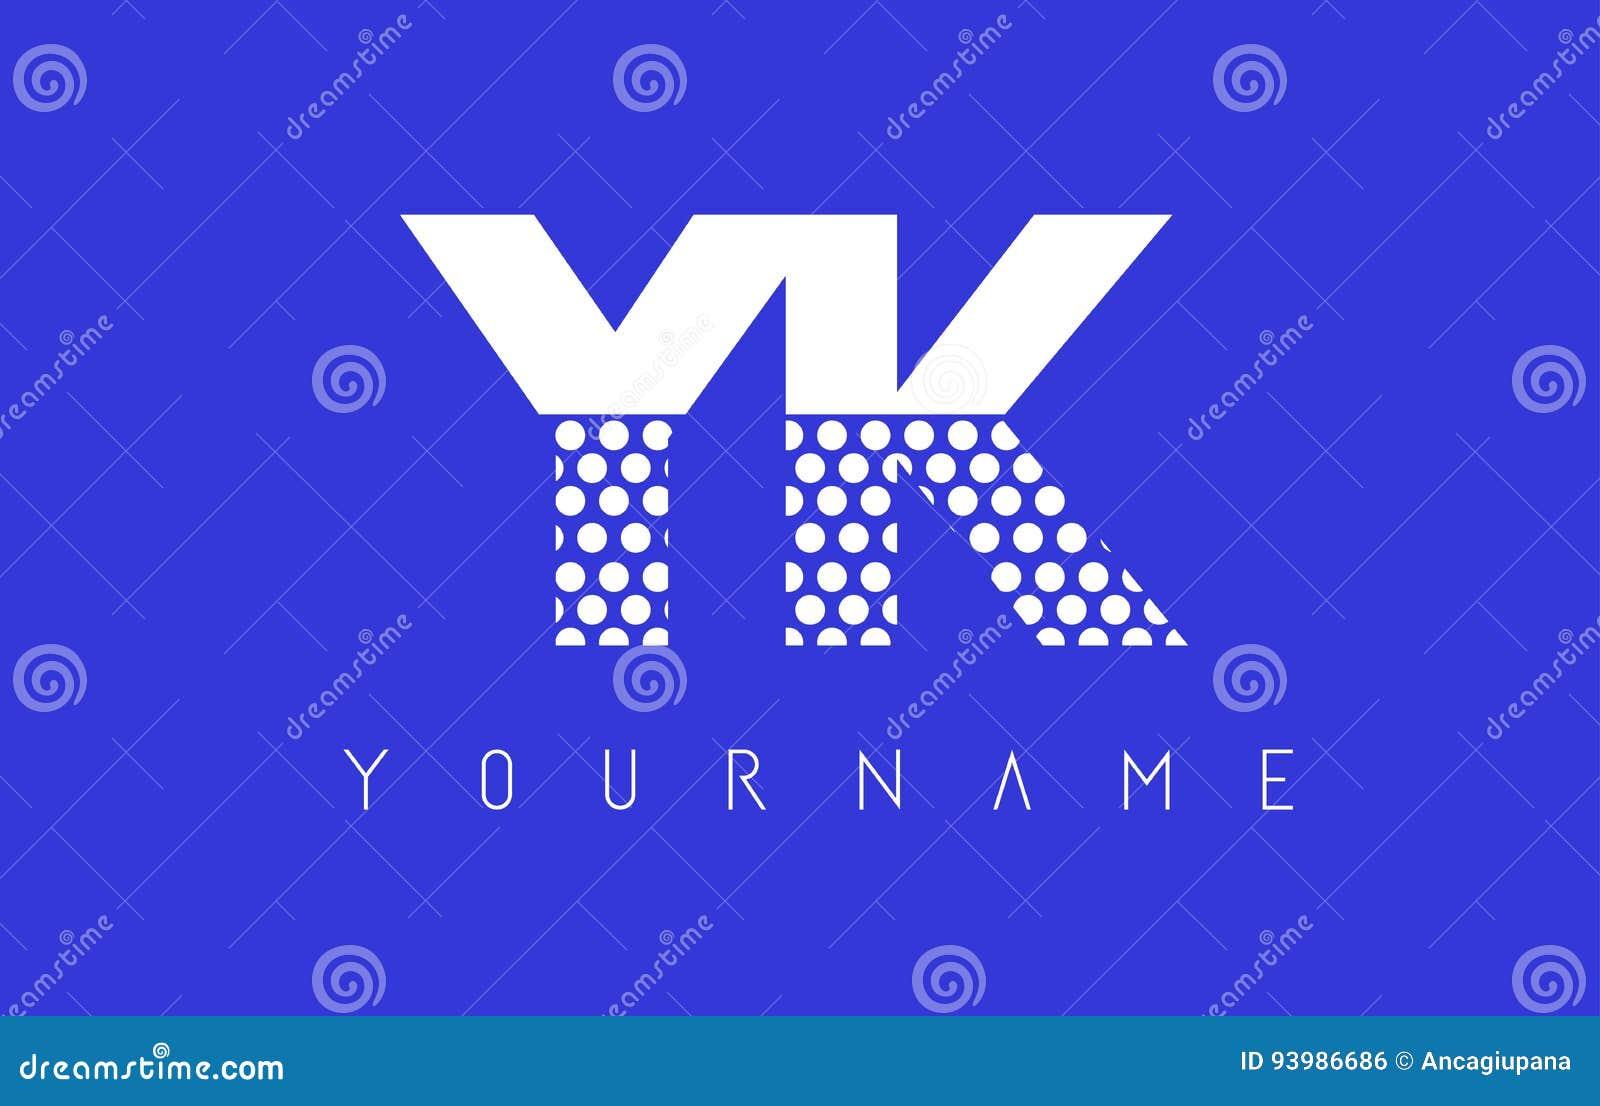 N M Name Wallpaper Game Wallpaper